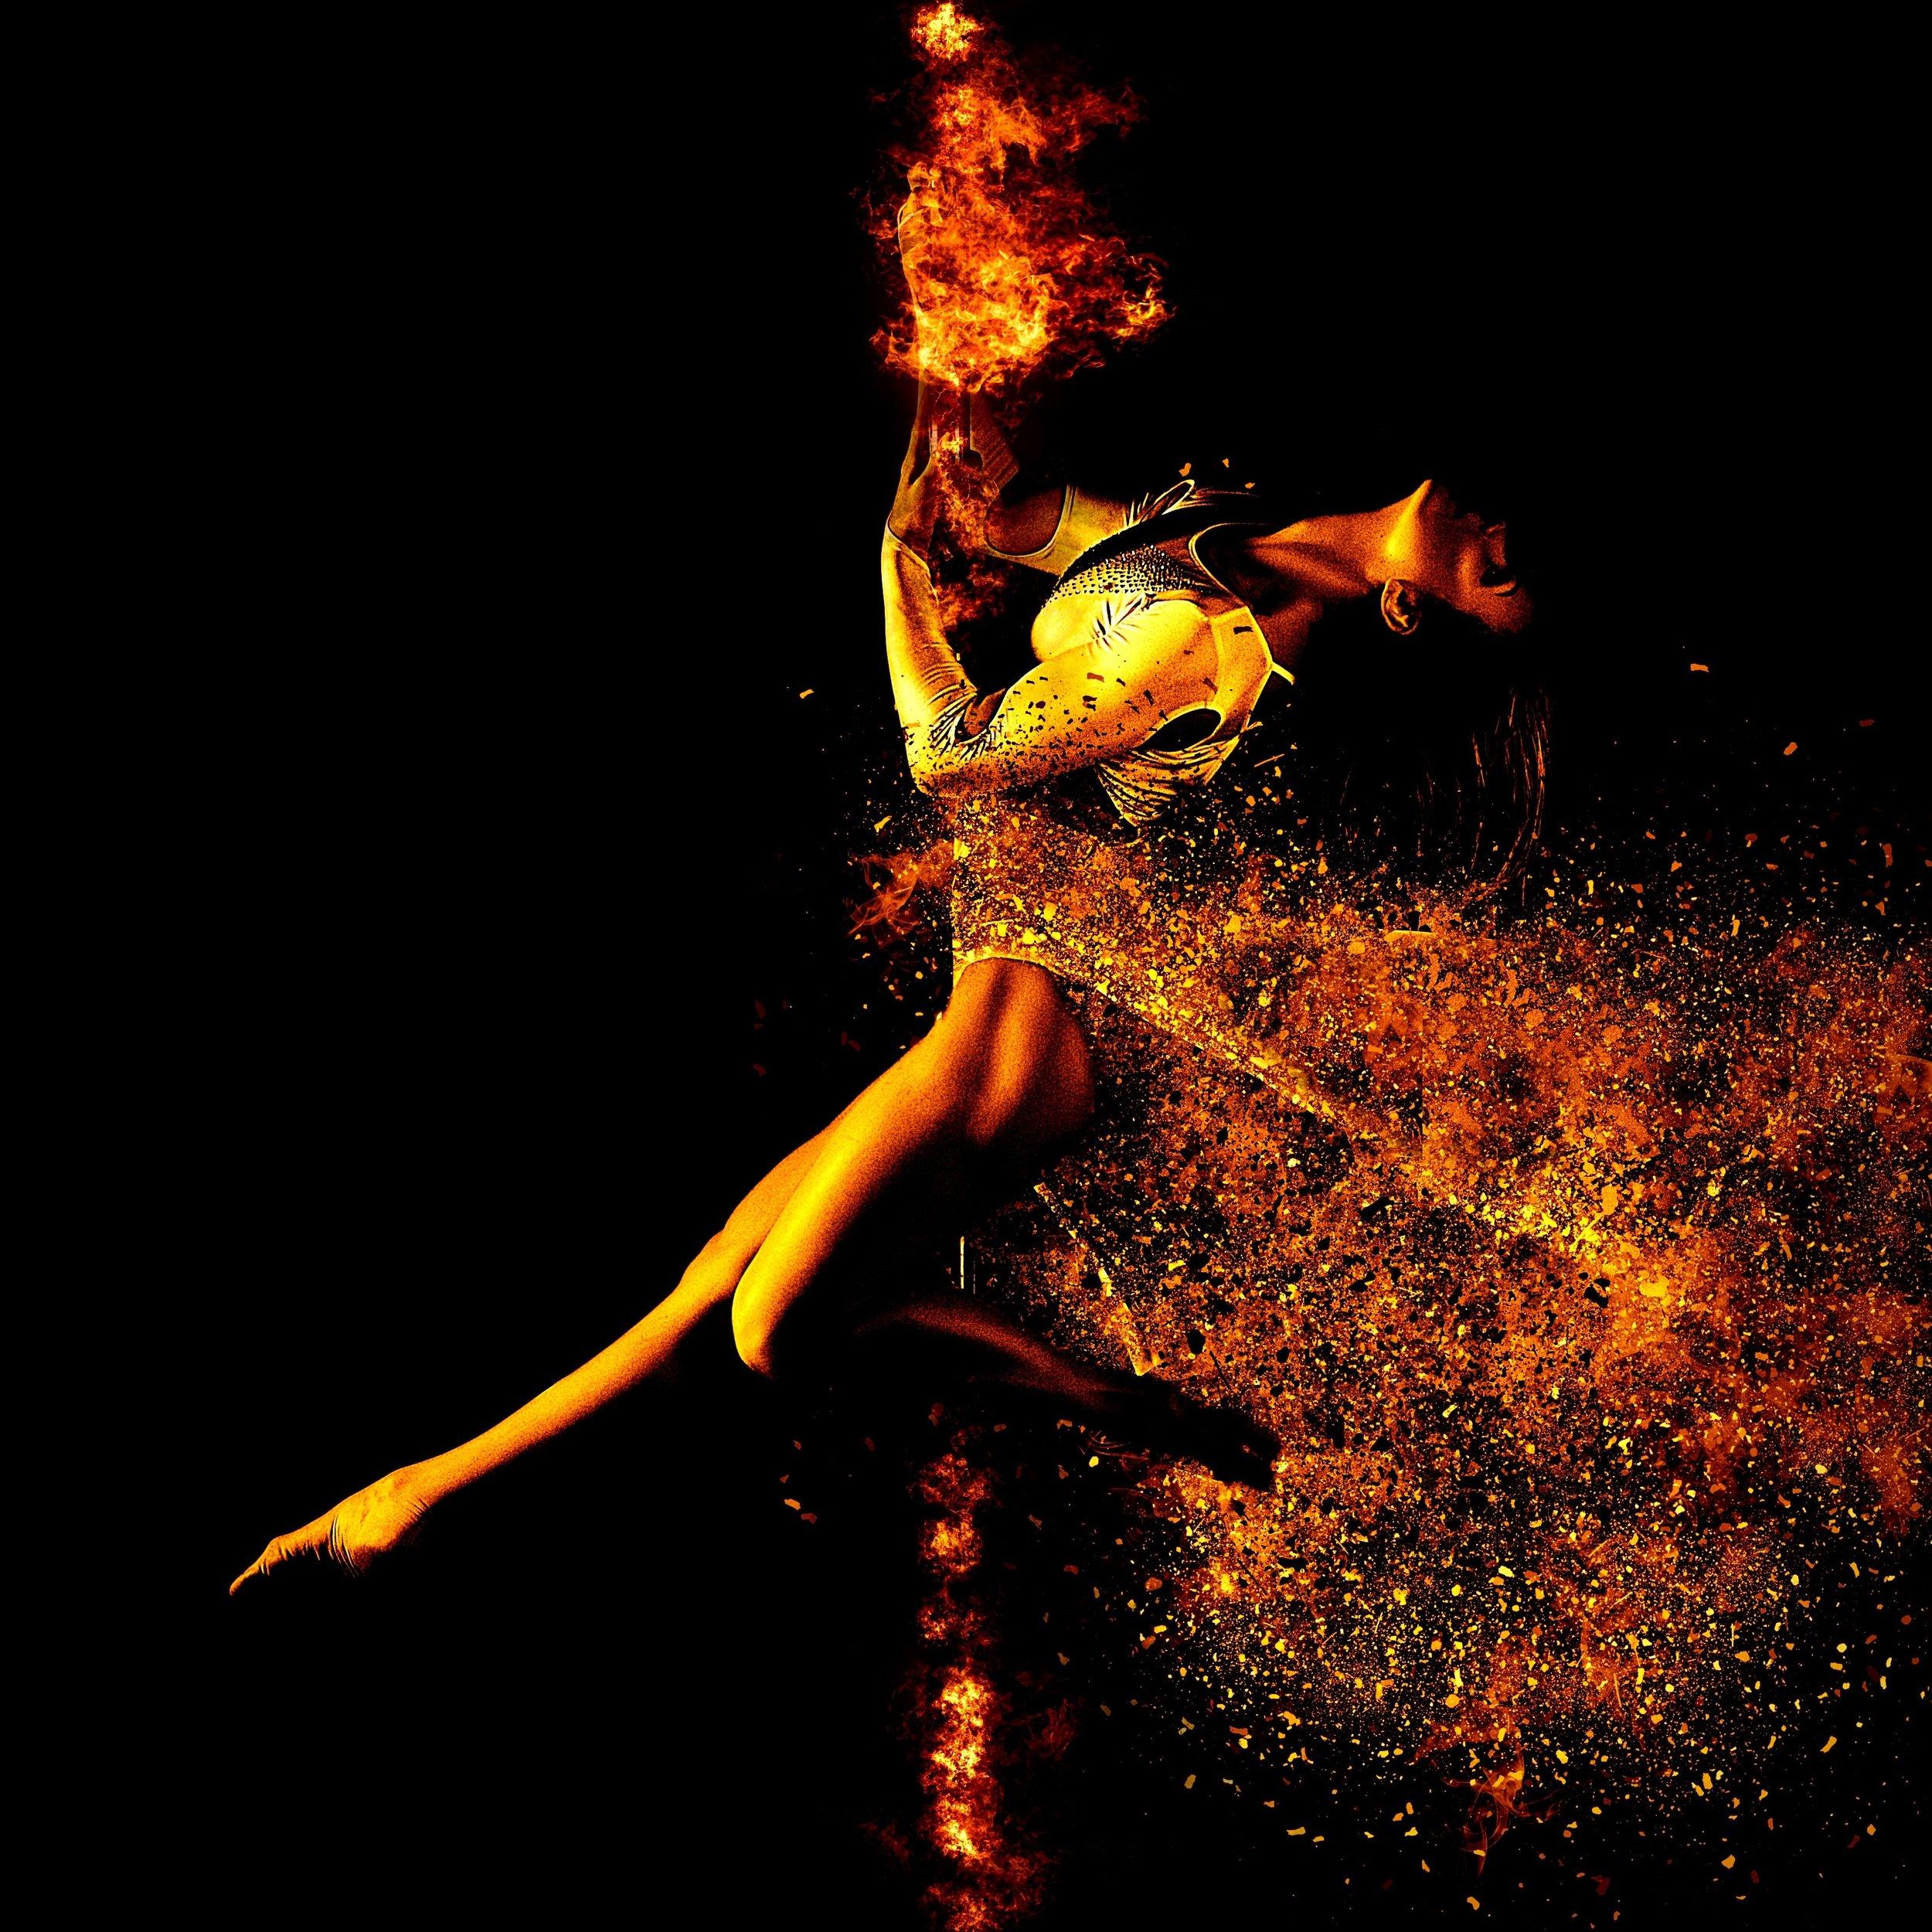 art-creative-dancing-236947 (1).jpg